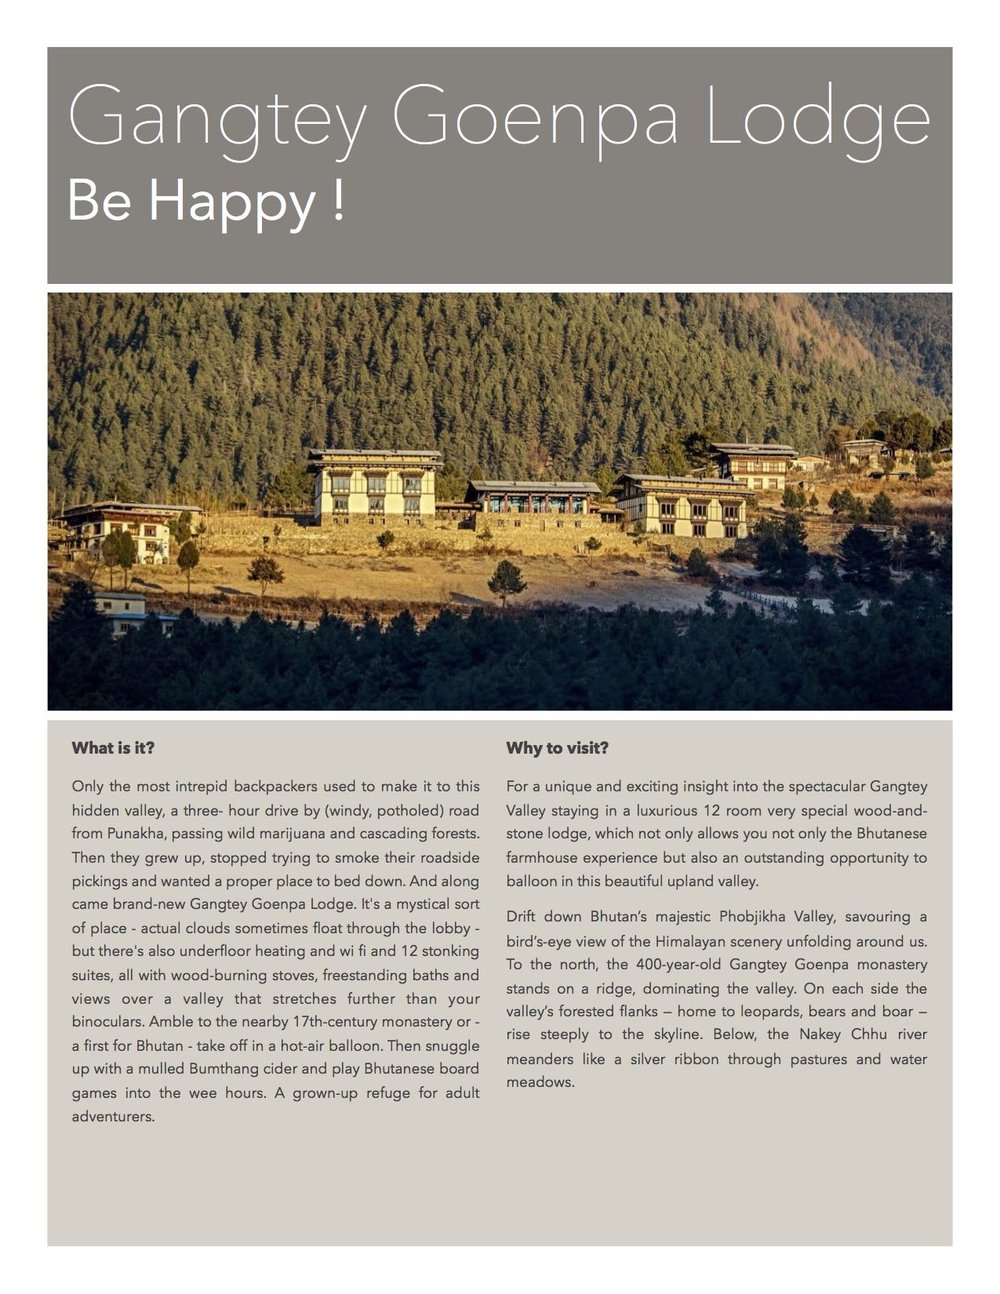 GGP - Your stay in Bhutan